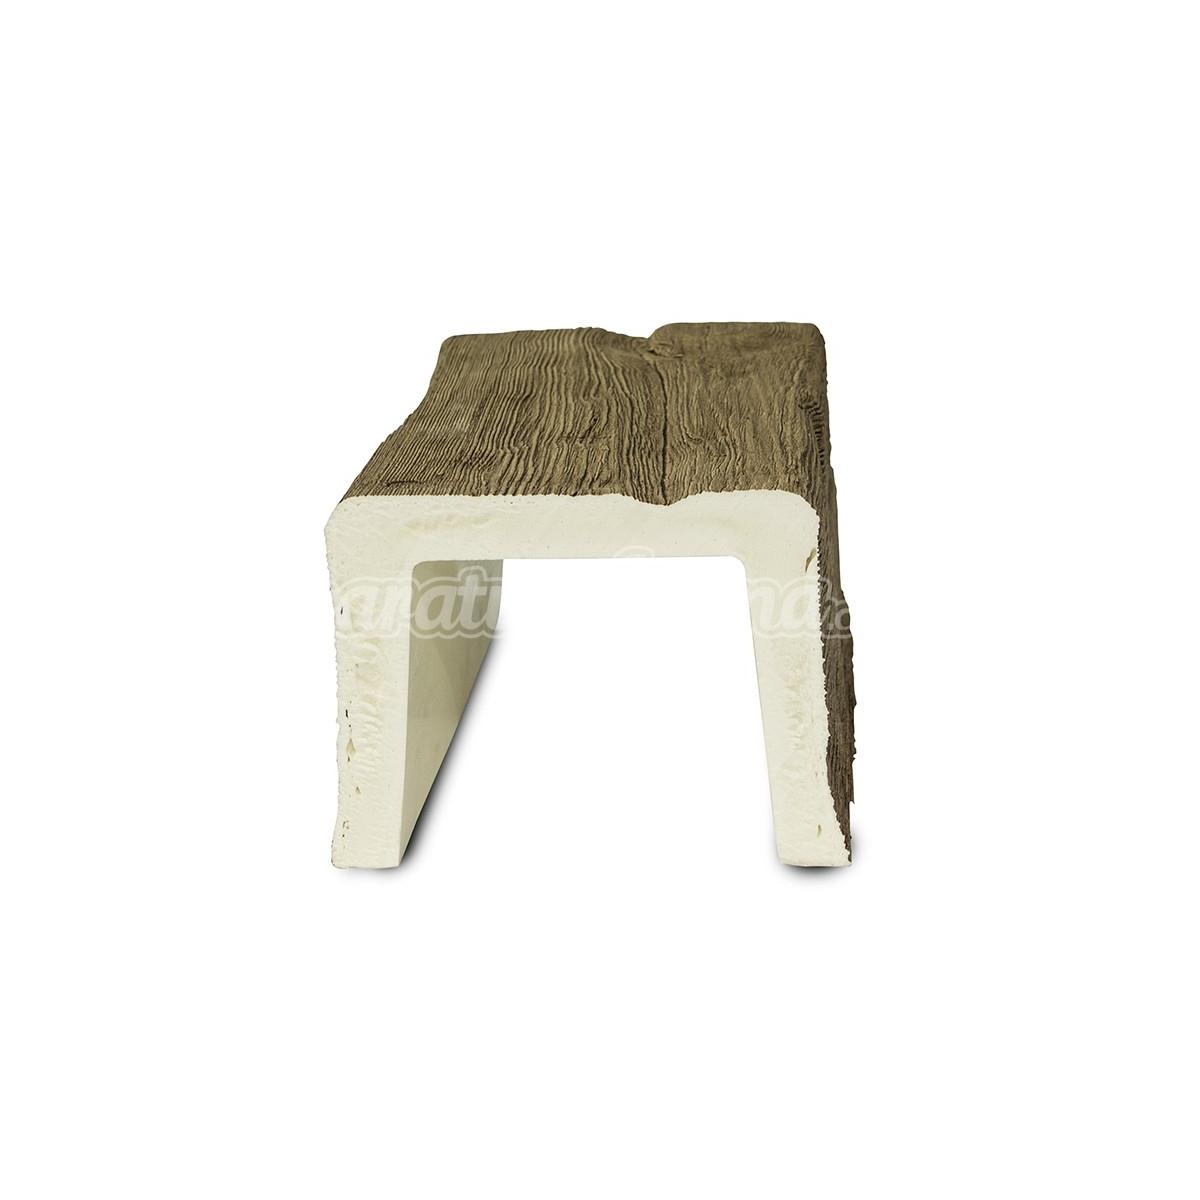 Viga 300x12,5x8 imitación madera Grupo Unamacor